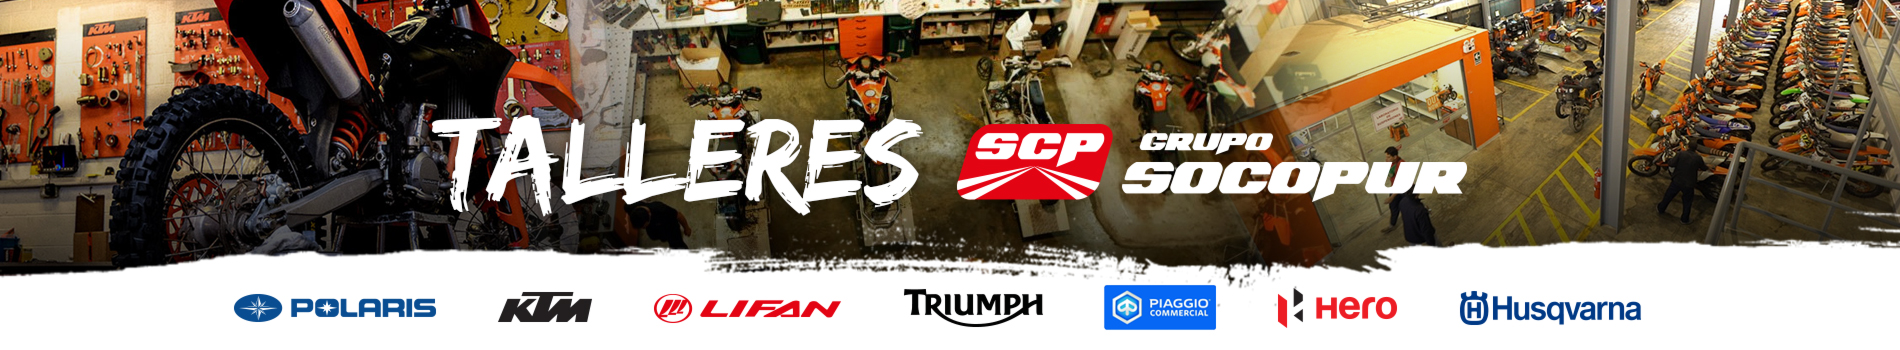 Socopur Motorsports - Talleres Socopur 1